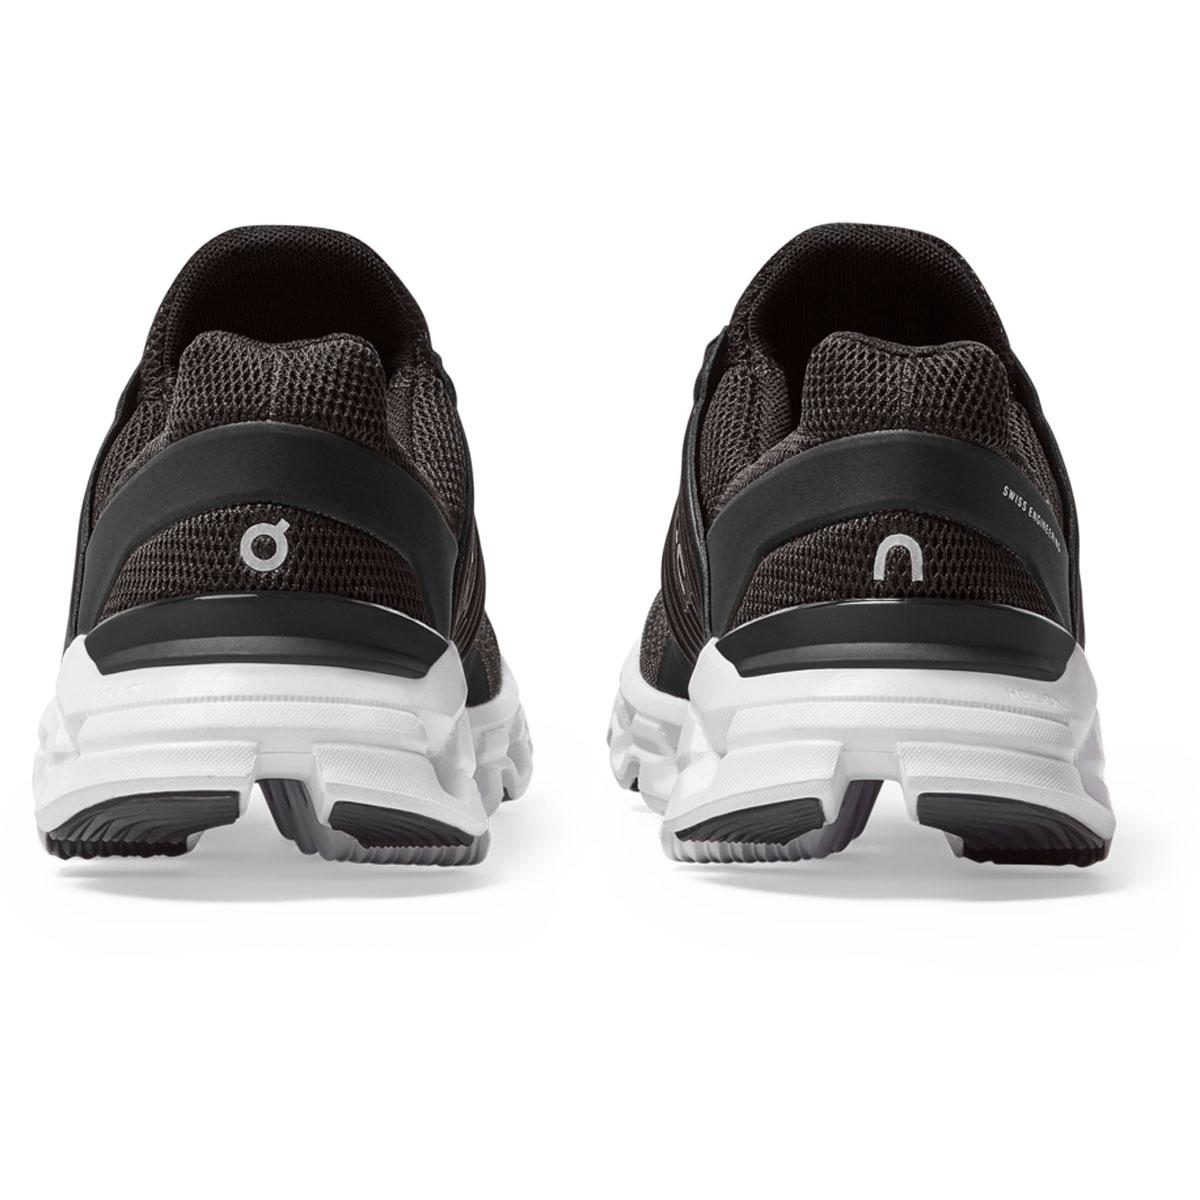 Women's On Cloudswift 2.0 Running Shoe - Color: Black/Rock - Size: 5 - Width: Regular, Black/Rock, large, image 3